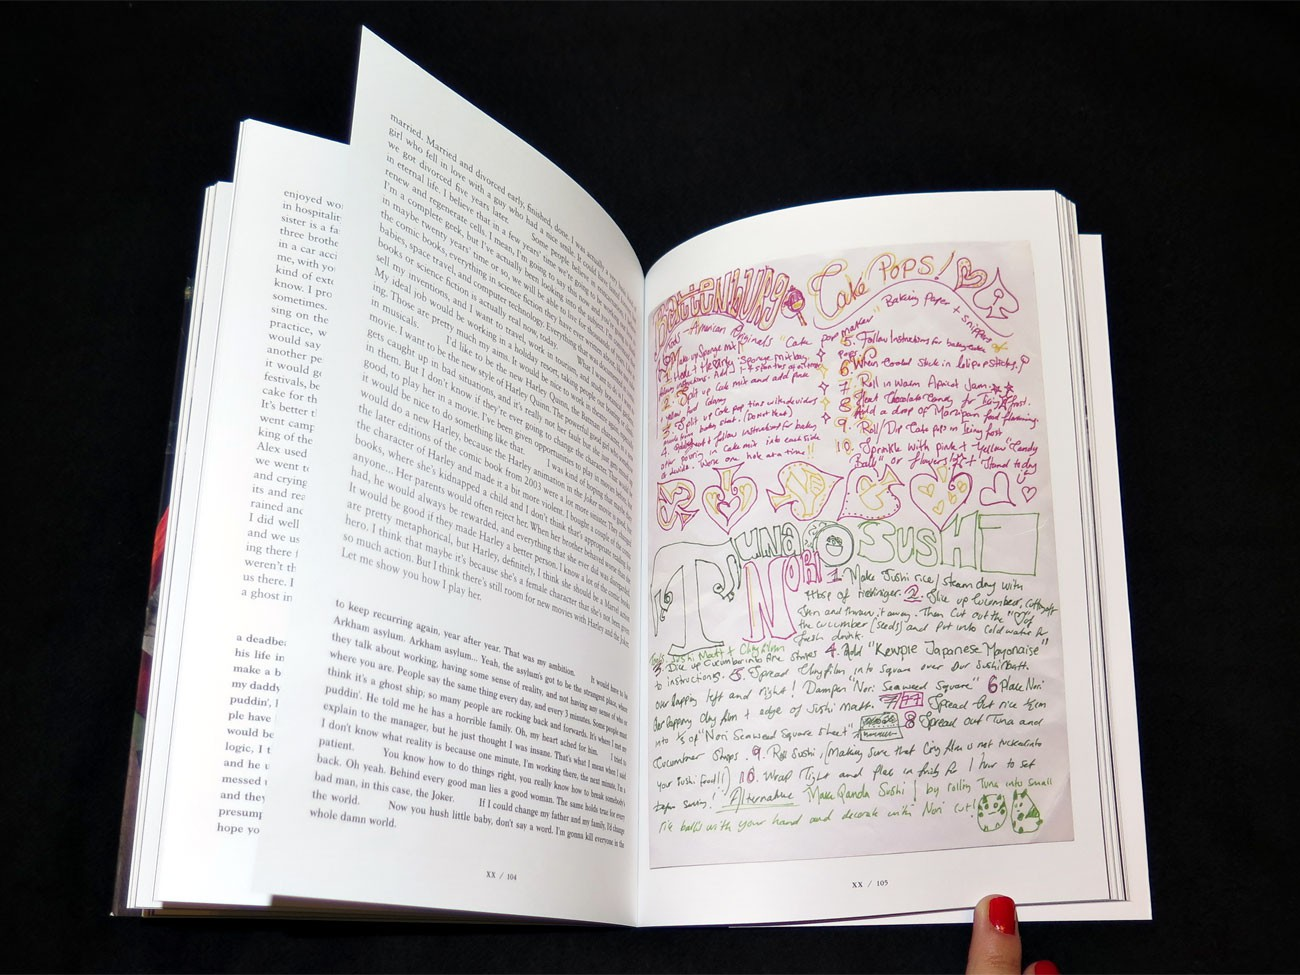 Slices of life, Elia Romanelli, Piero Vereni, Ottavia Castellina, Bruno